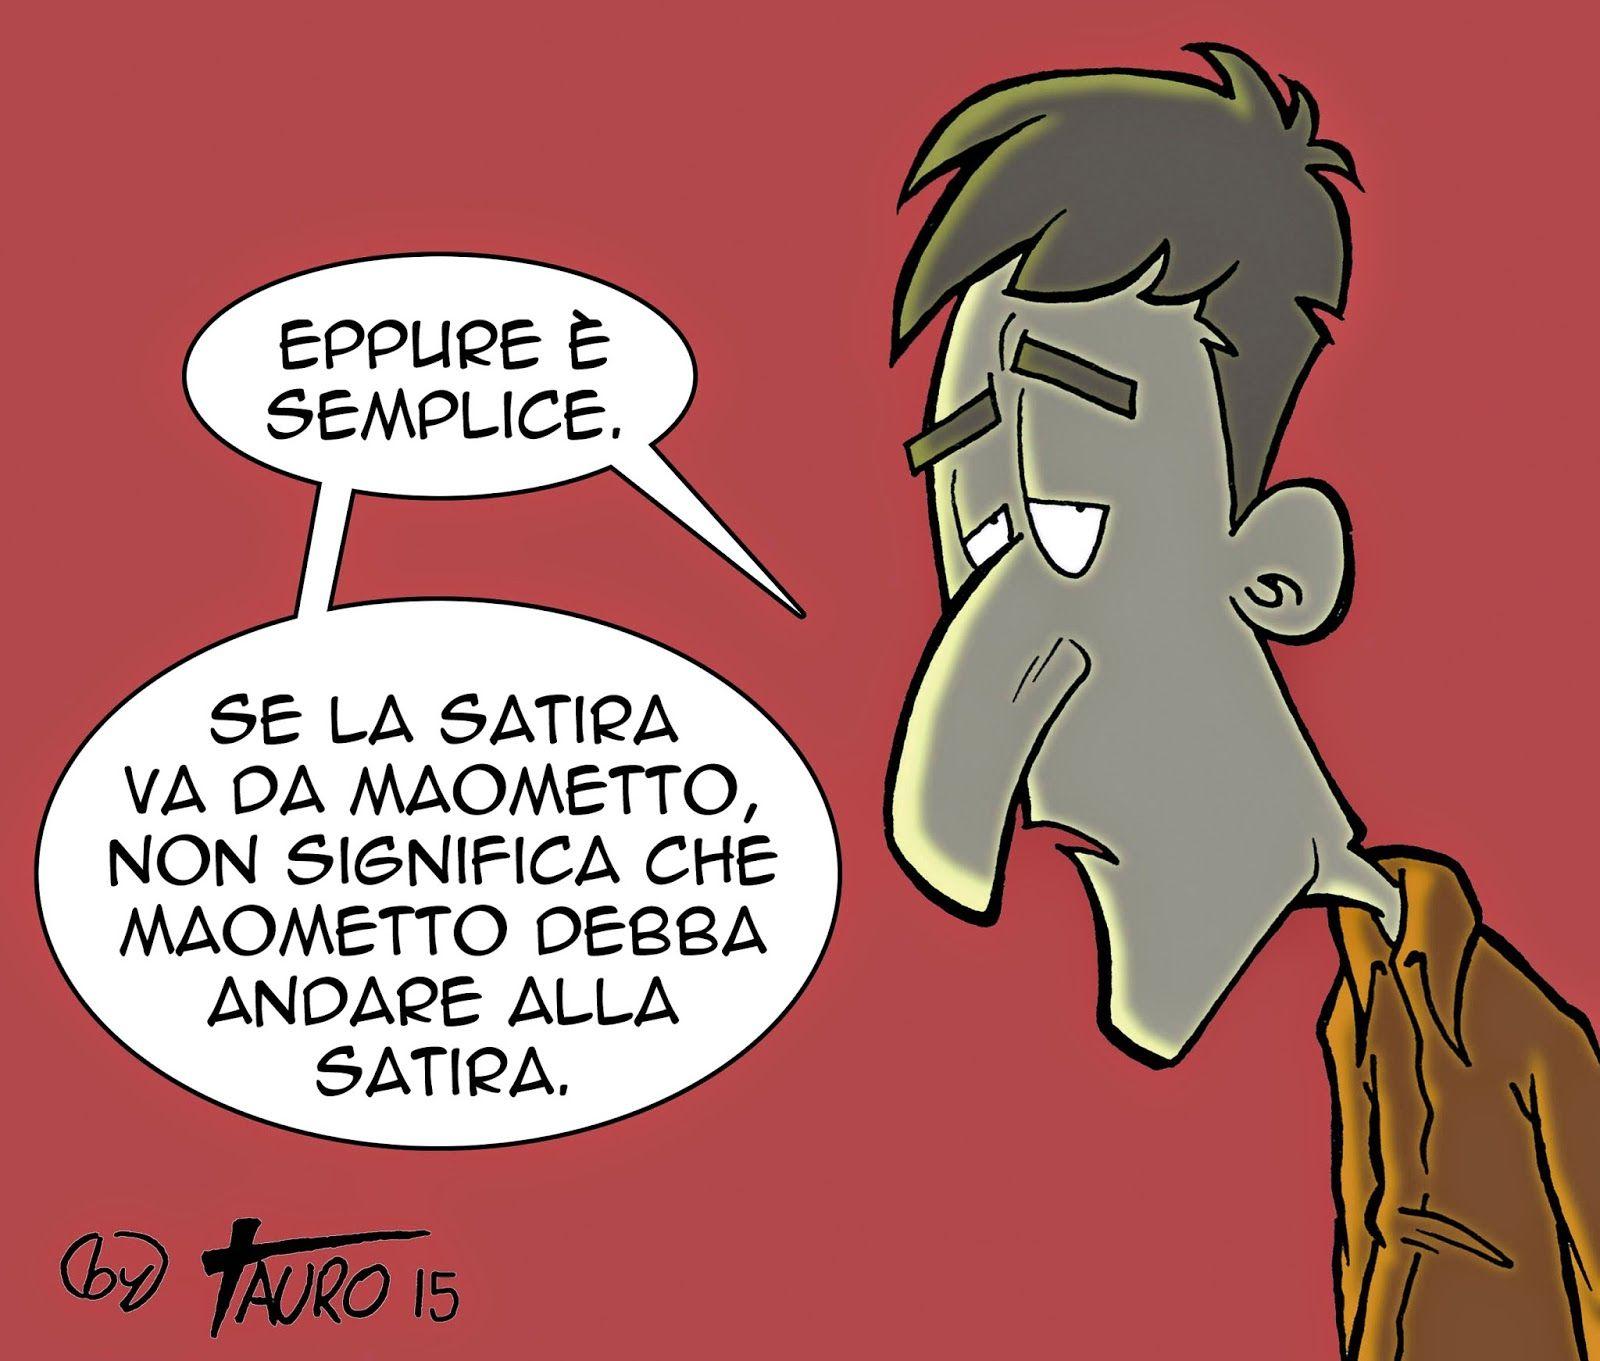 Tauraggini: Eppure... - Antonio Silvestri, Tauro - 8 gennaio §